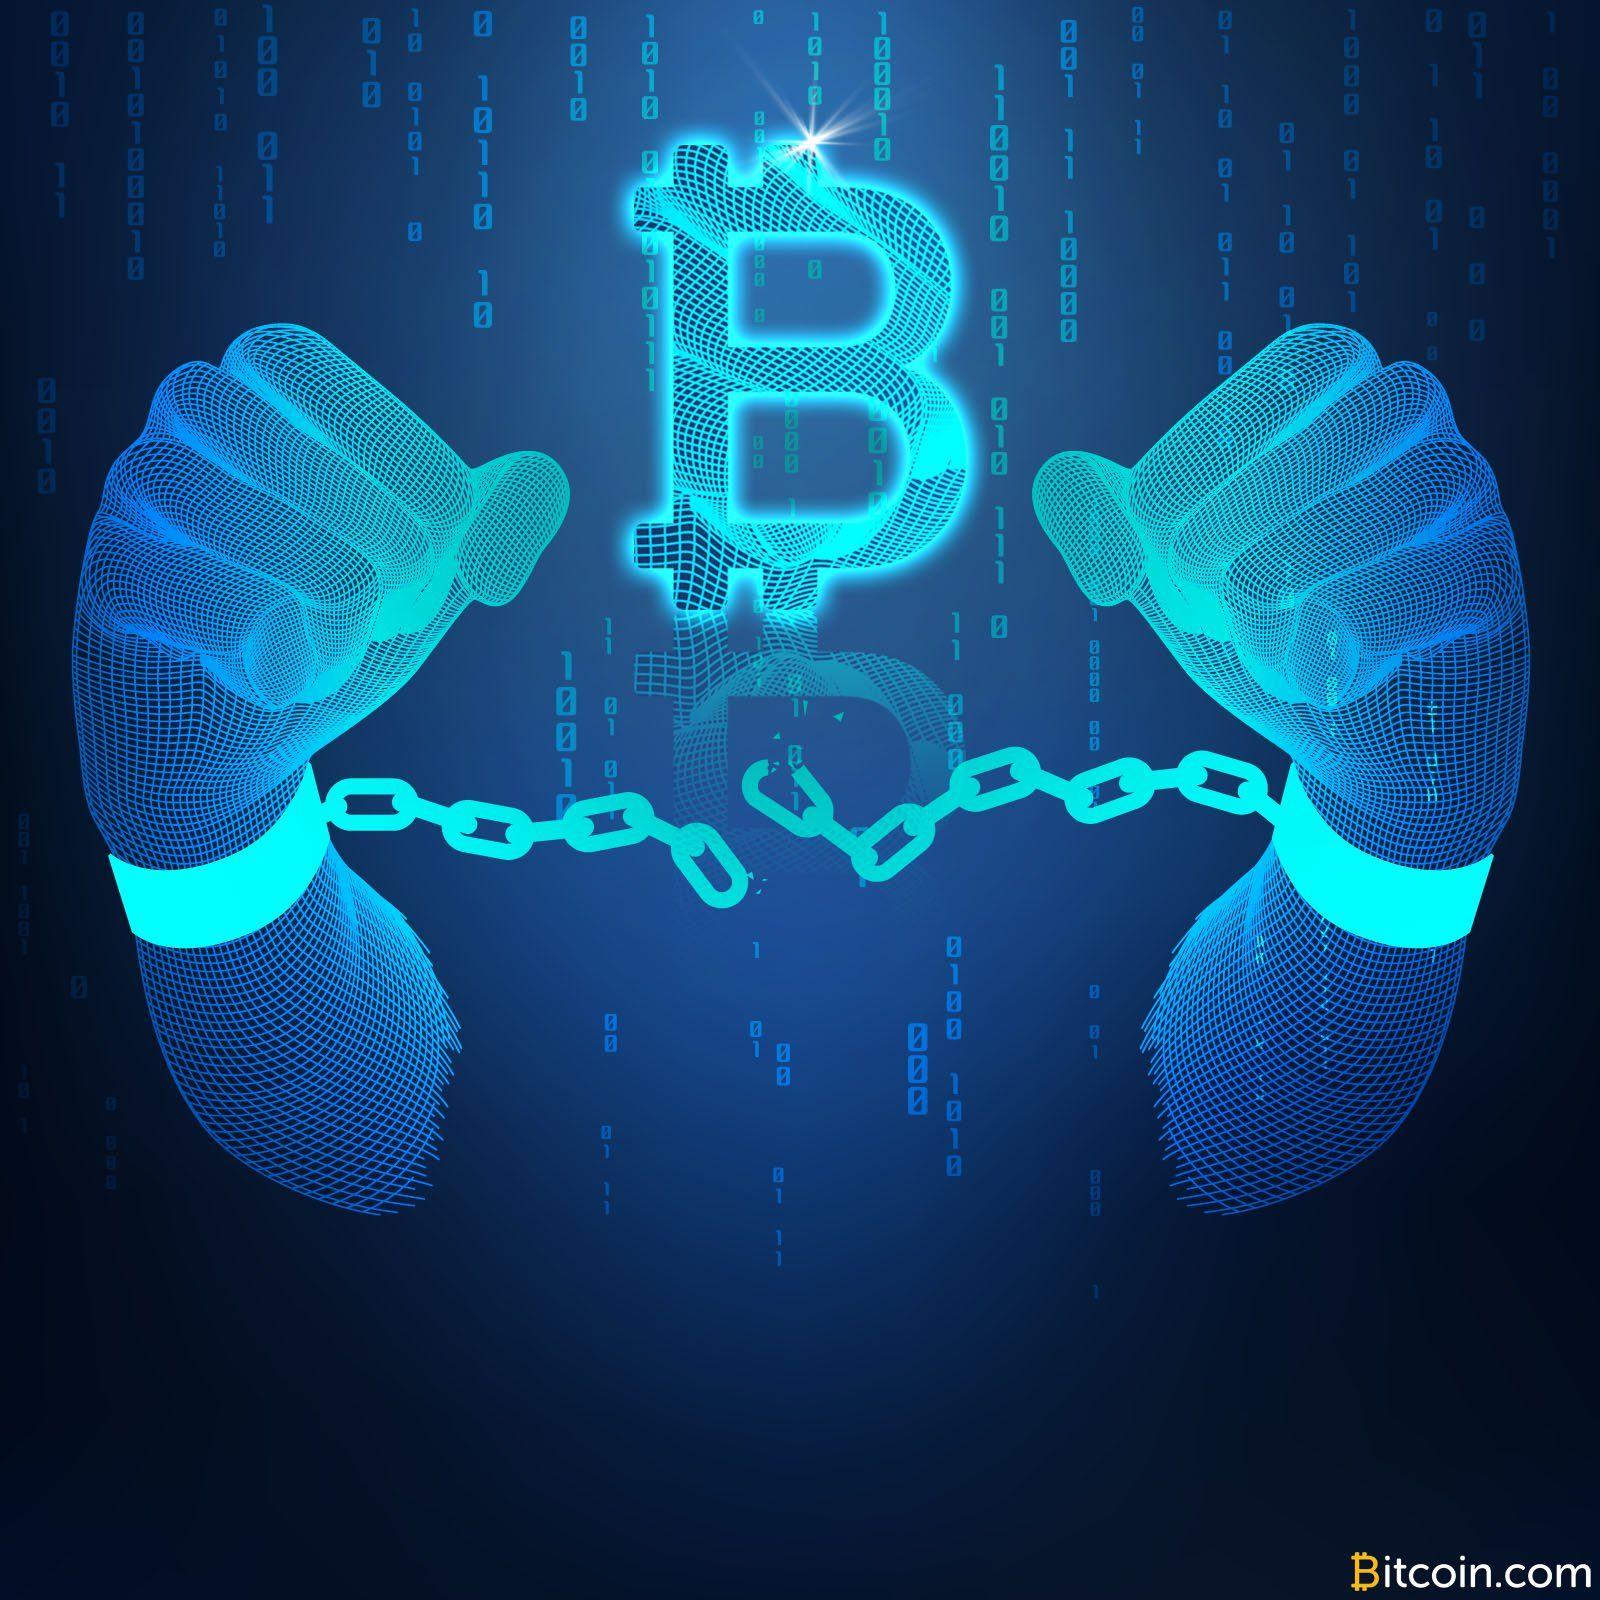 merrill lynch and bitcoin